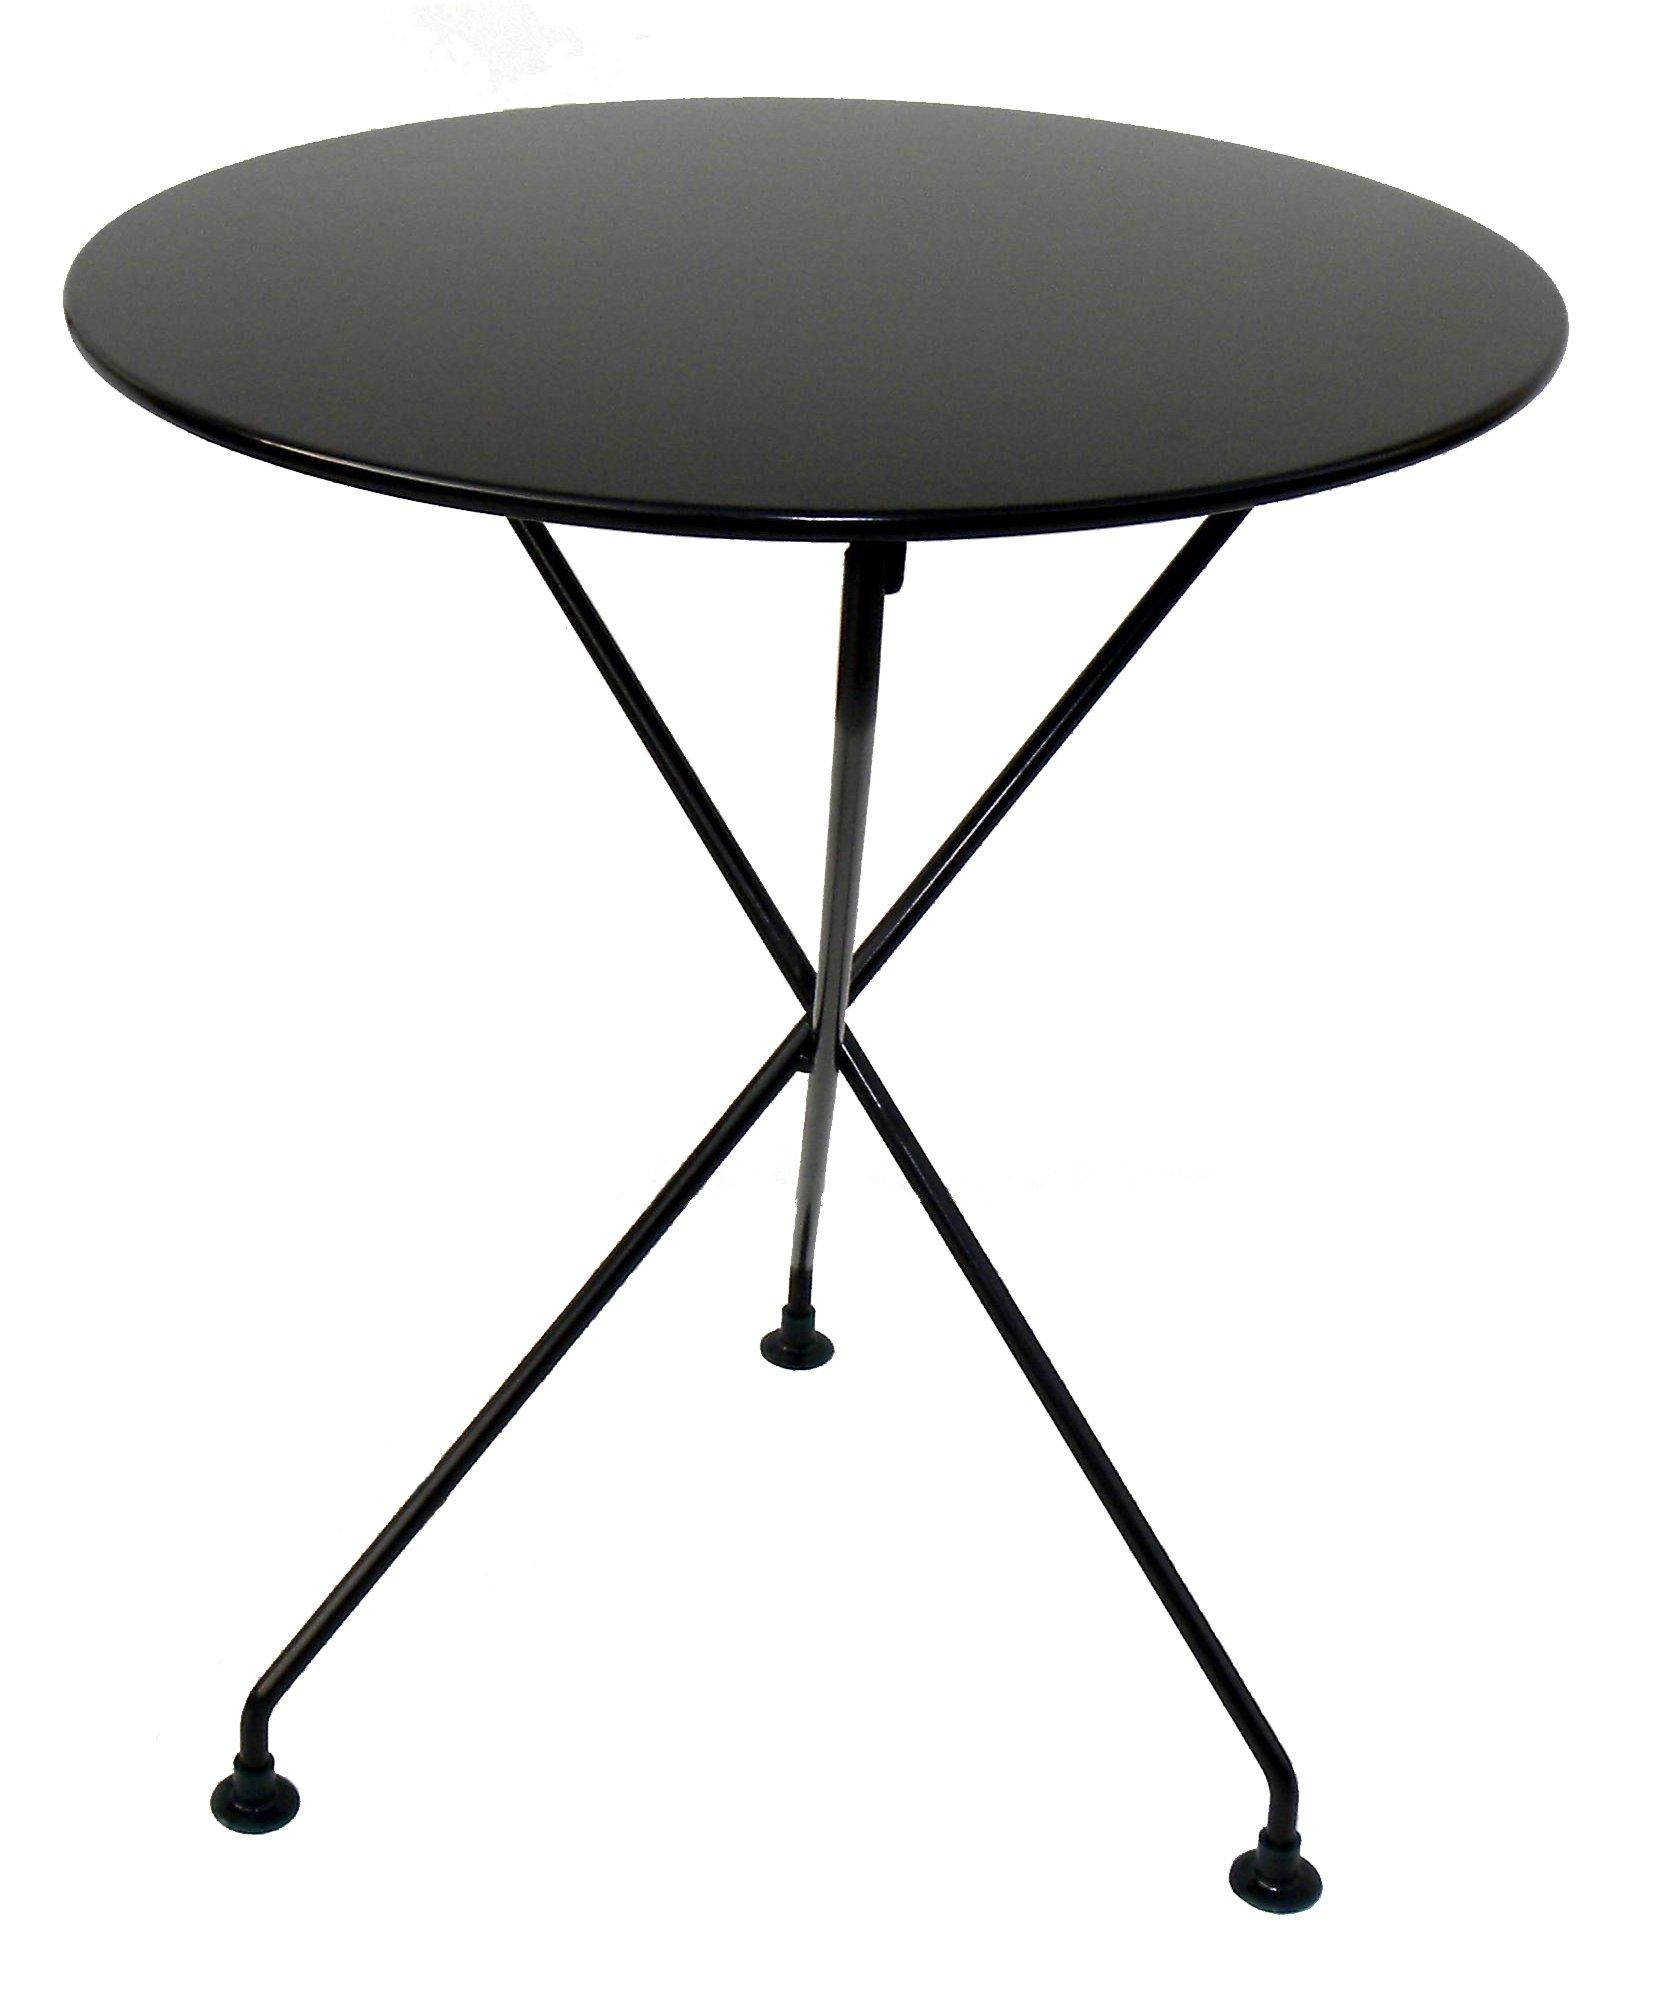 Mobel Designhaus French Café Bistro 3-leg Folding Bistro Table, Jet Black Frame, 24'' Round Metal Top x 29'' Height